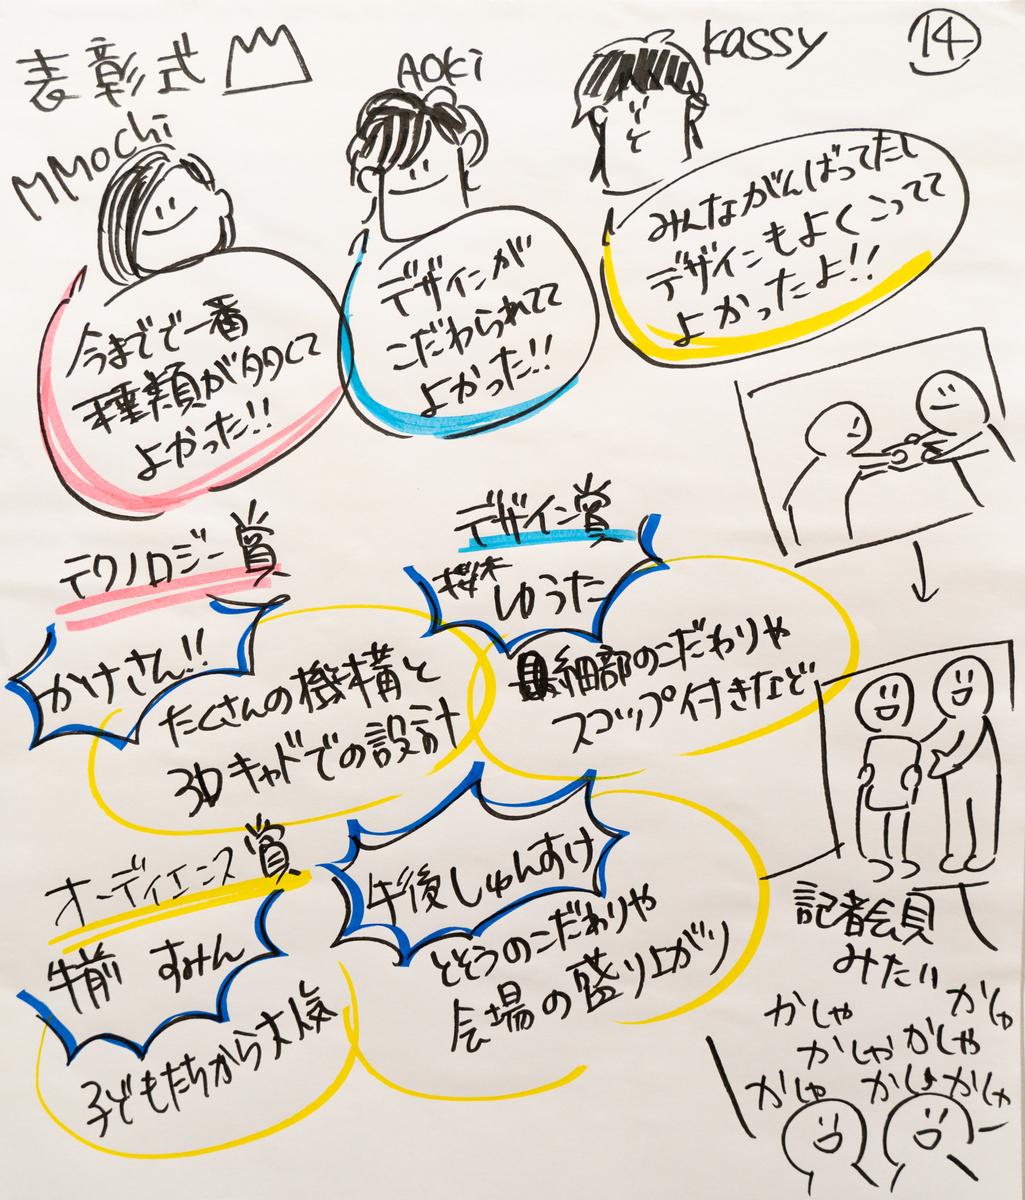 f:id:nakatsuka808:20190924095643j:plain